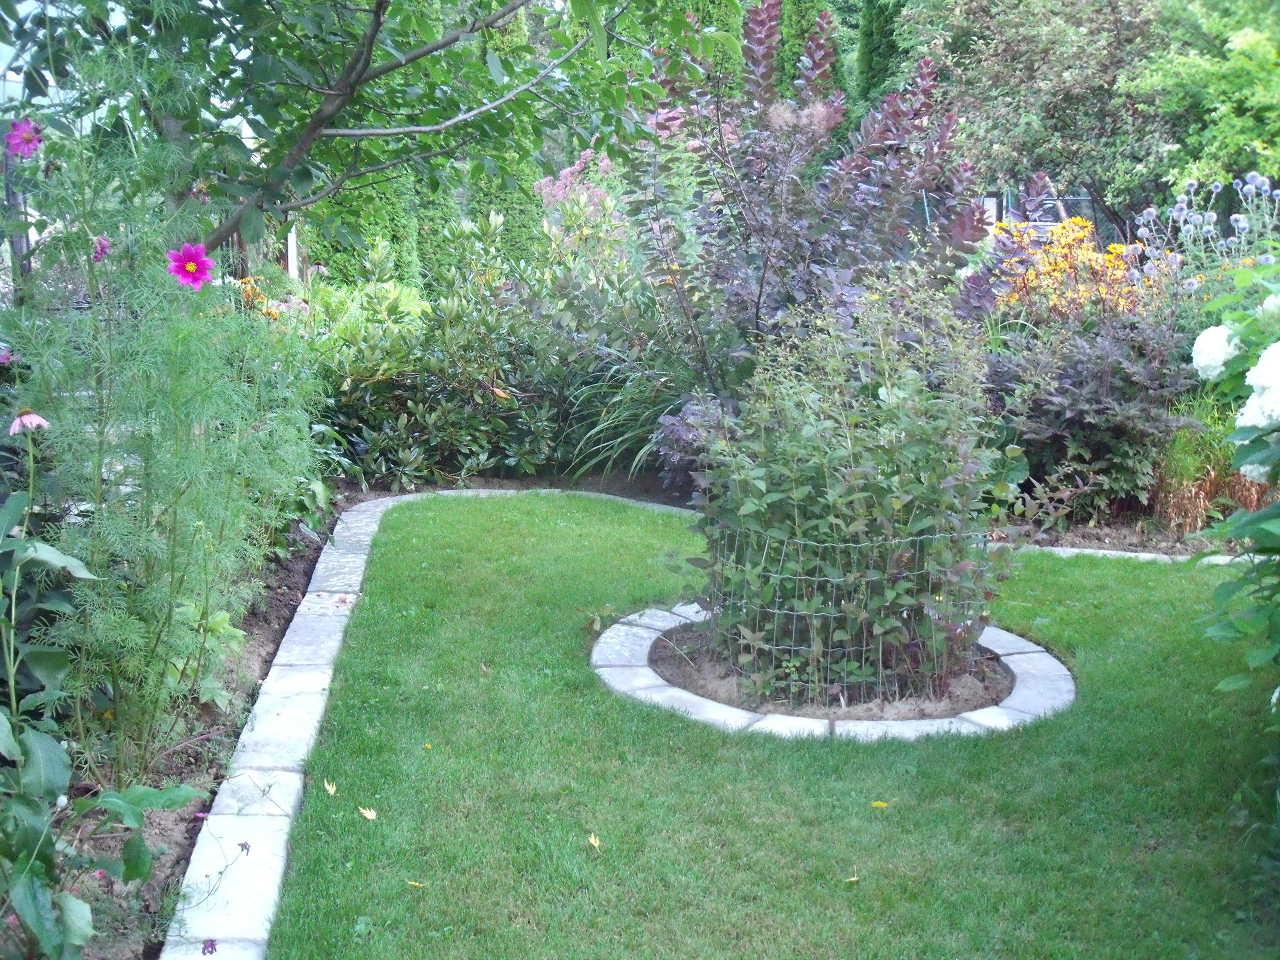 4 Curved Garden Edging Lawn Landscape Molds Make Concrete